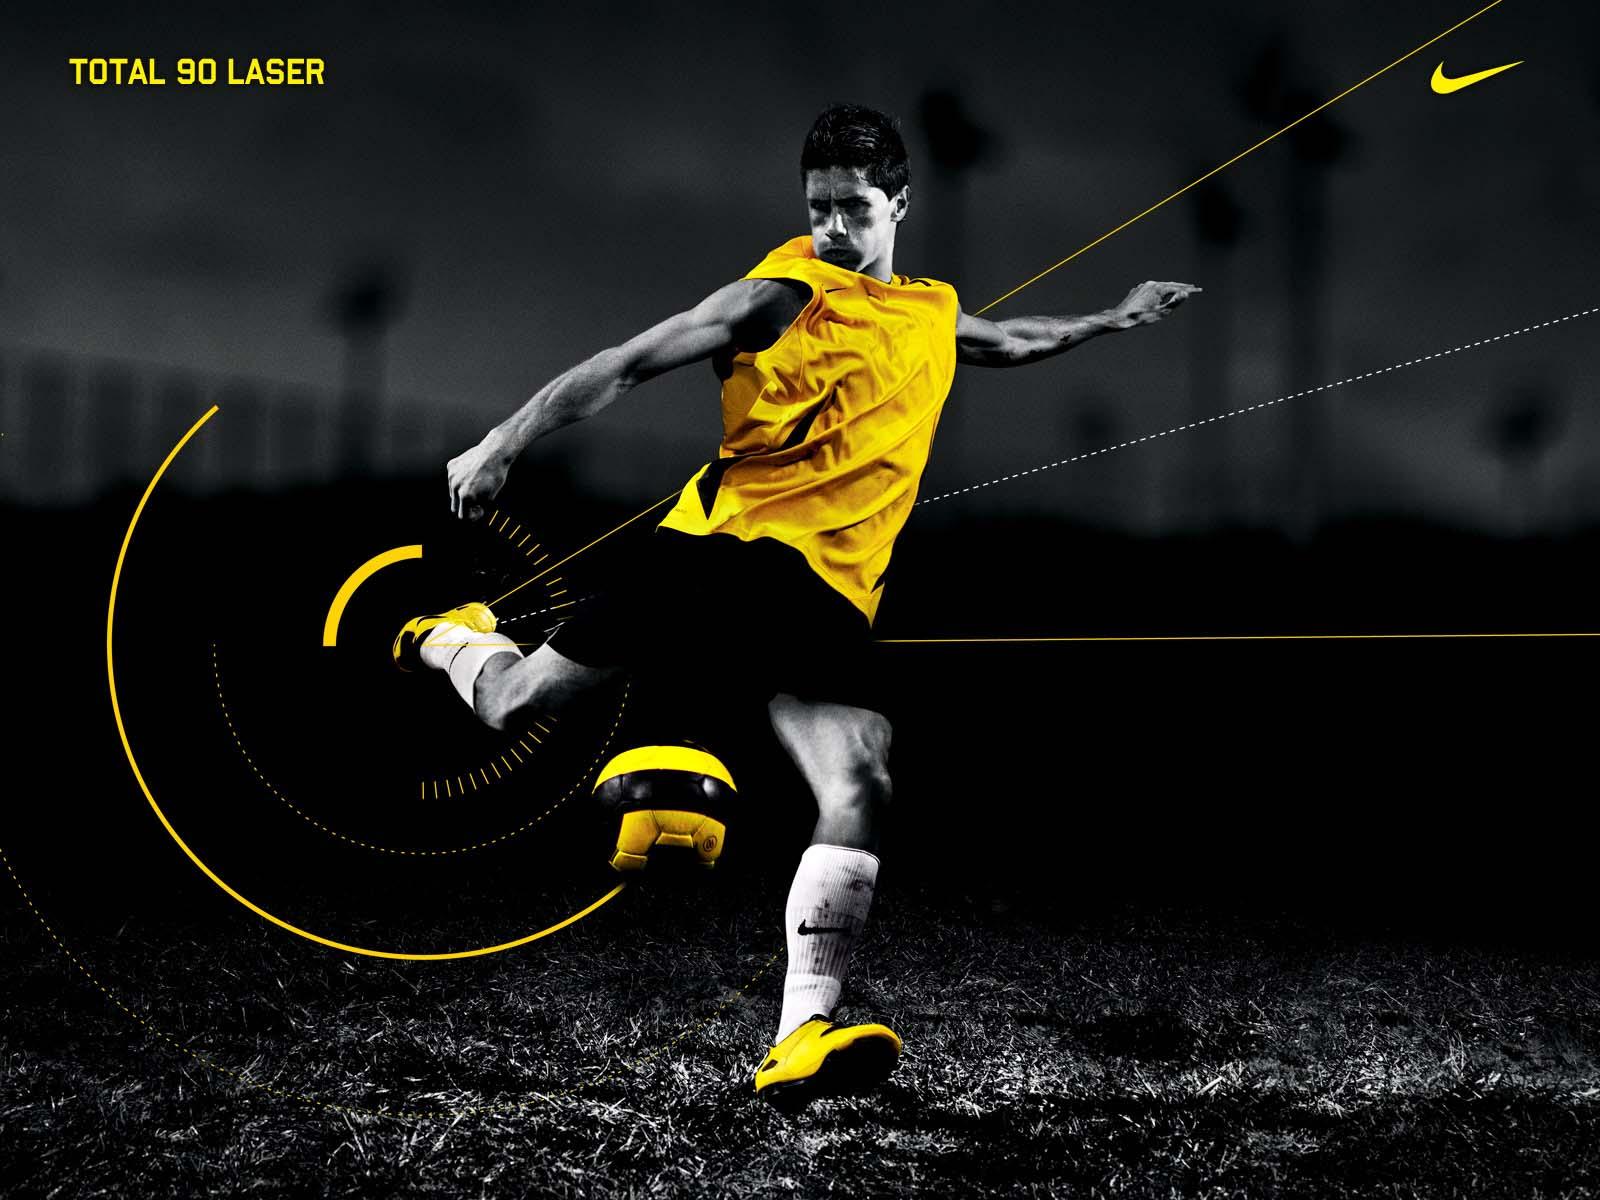 World wide soccer hd photos hd soccer wallpaper hd soccer wallpaper voltagebd Choice Image